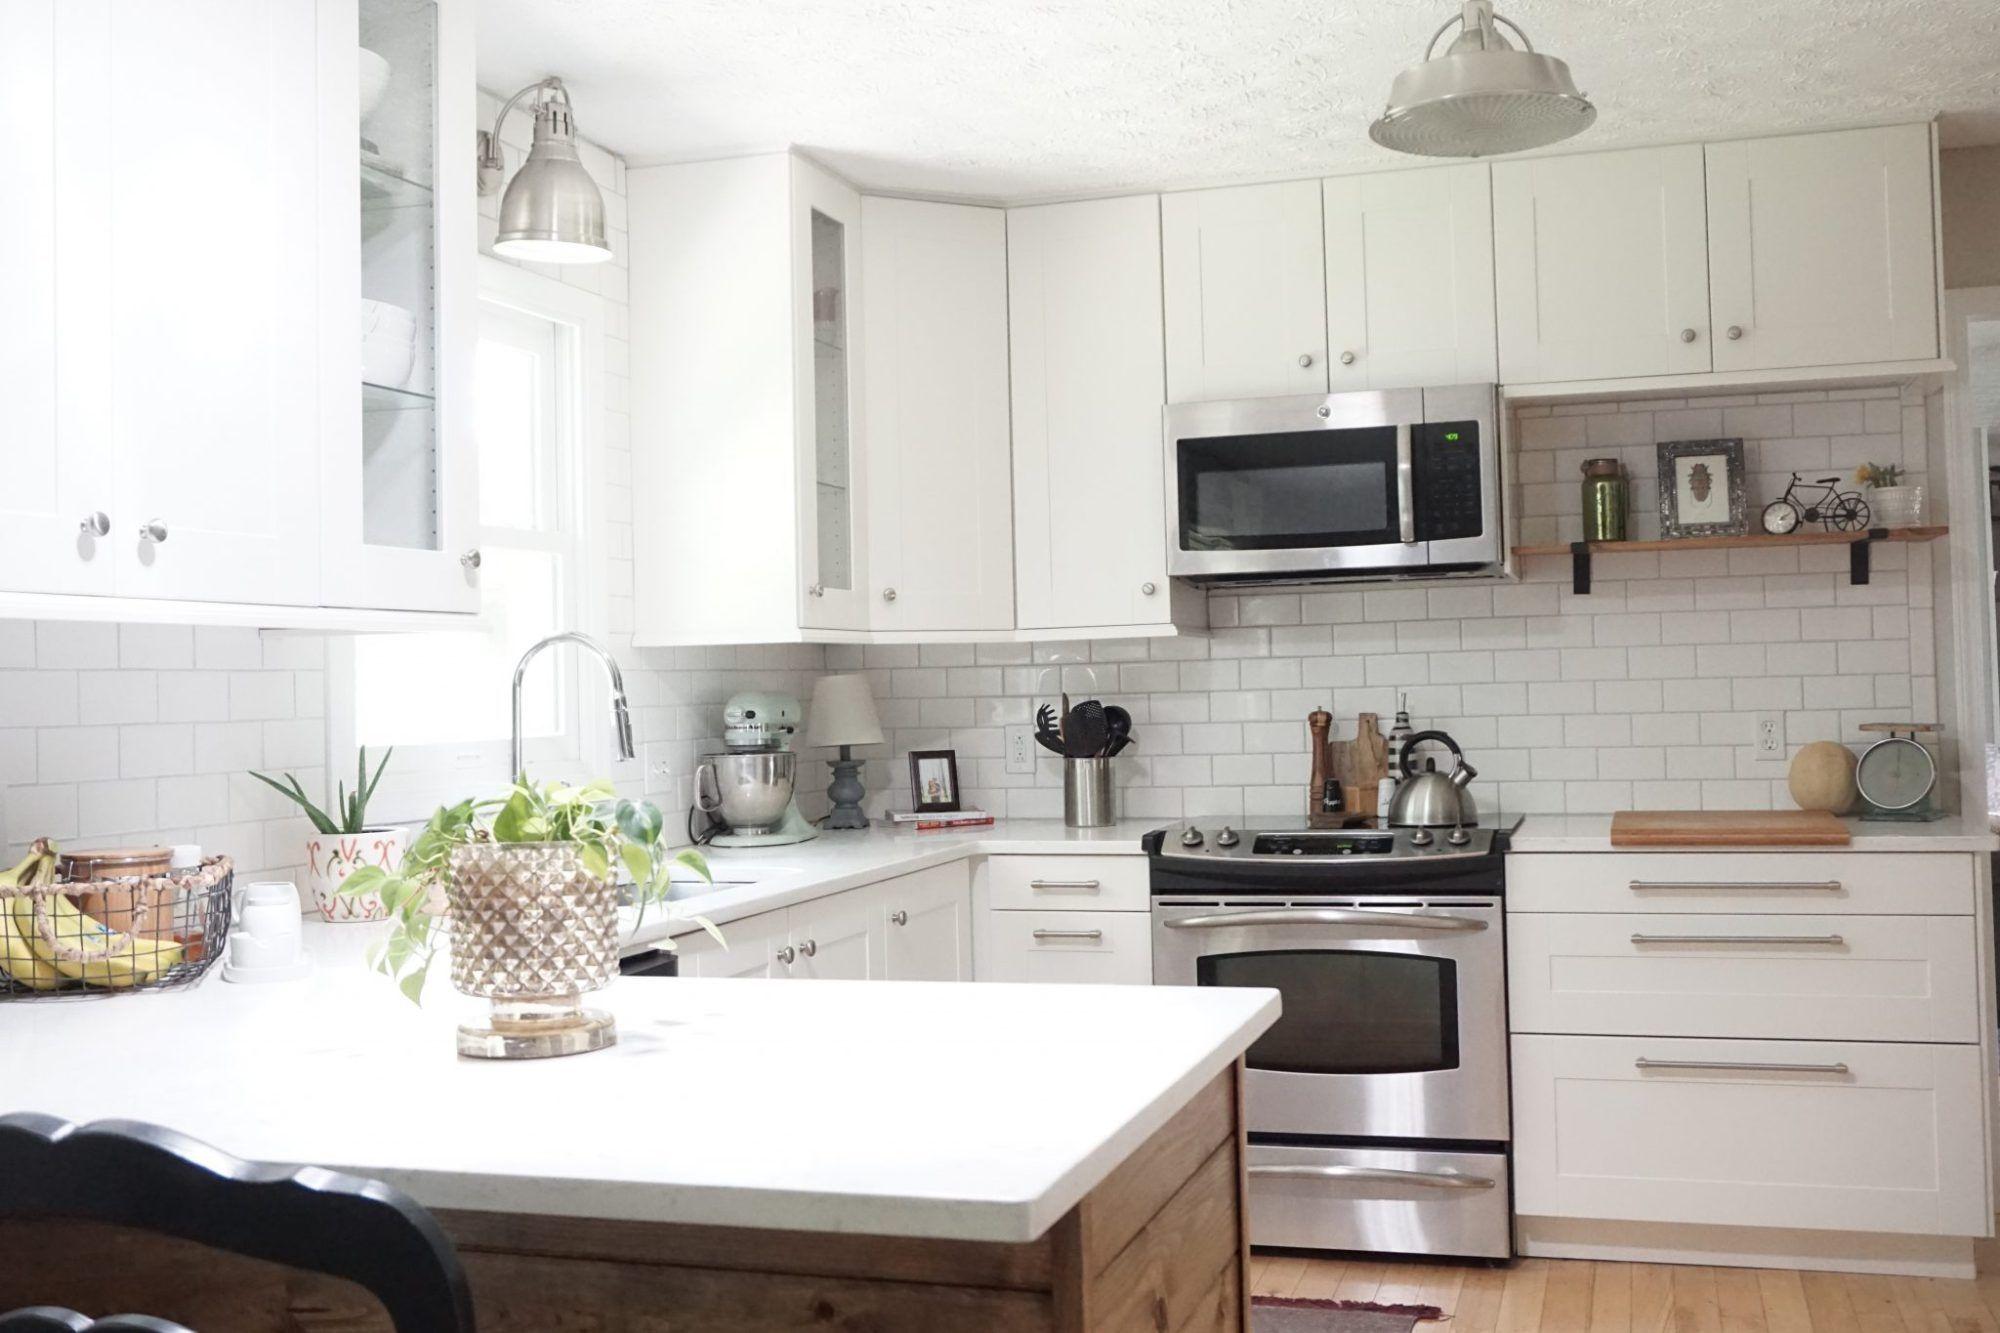 IKEA SEKTION Kitchen Review Ikea kitchen